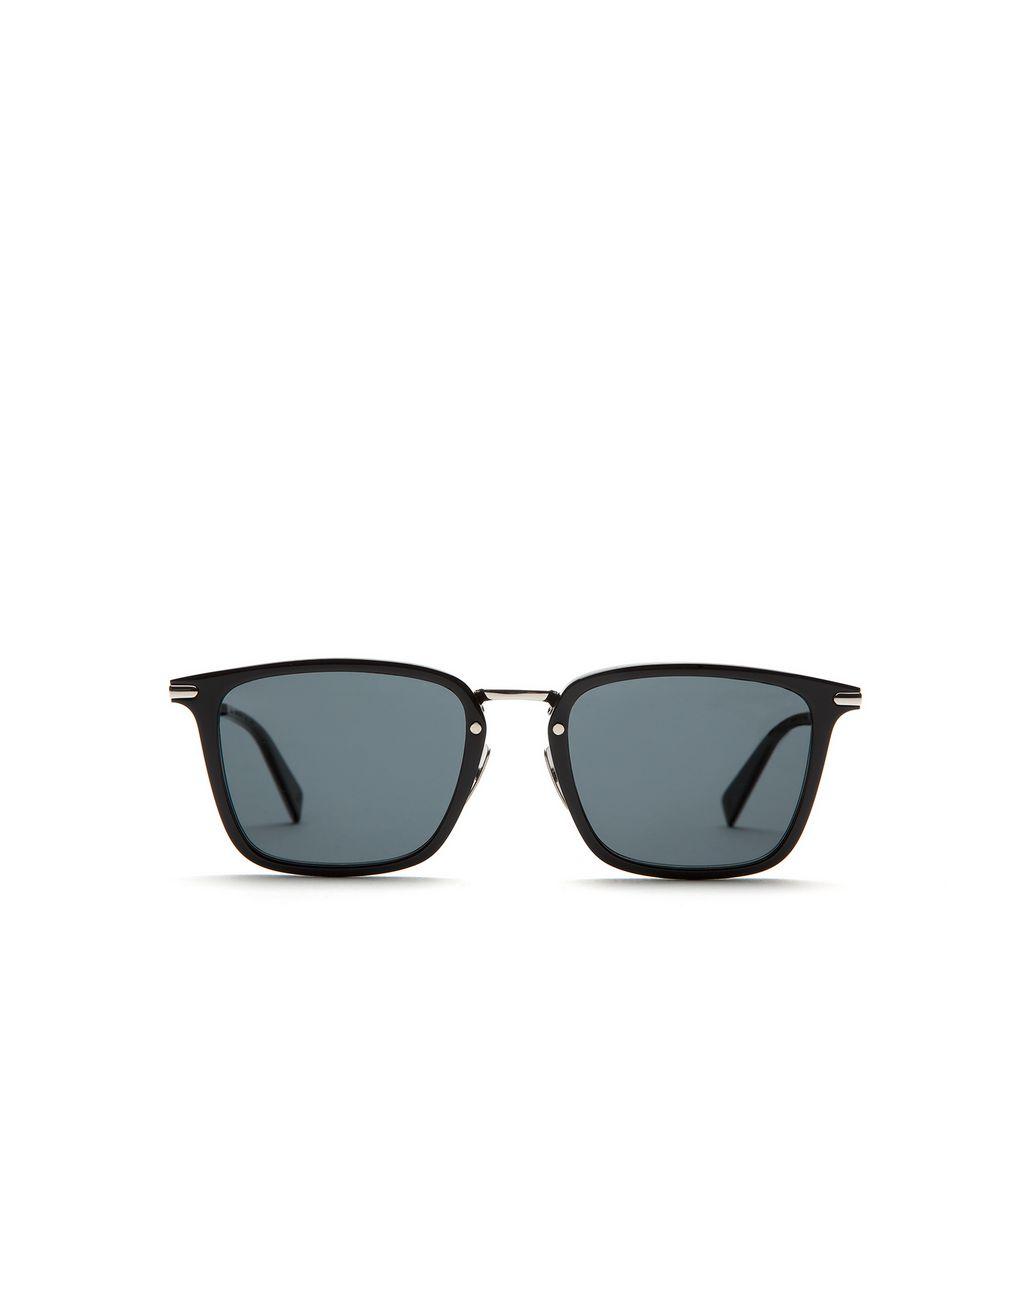 BRIONI Shiny Black Squared Sunglasses with Gray Lenses  Sunglasses Man f